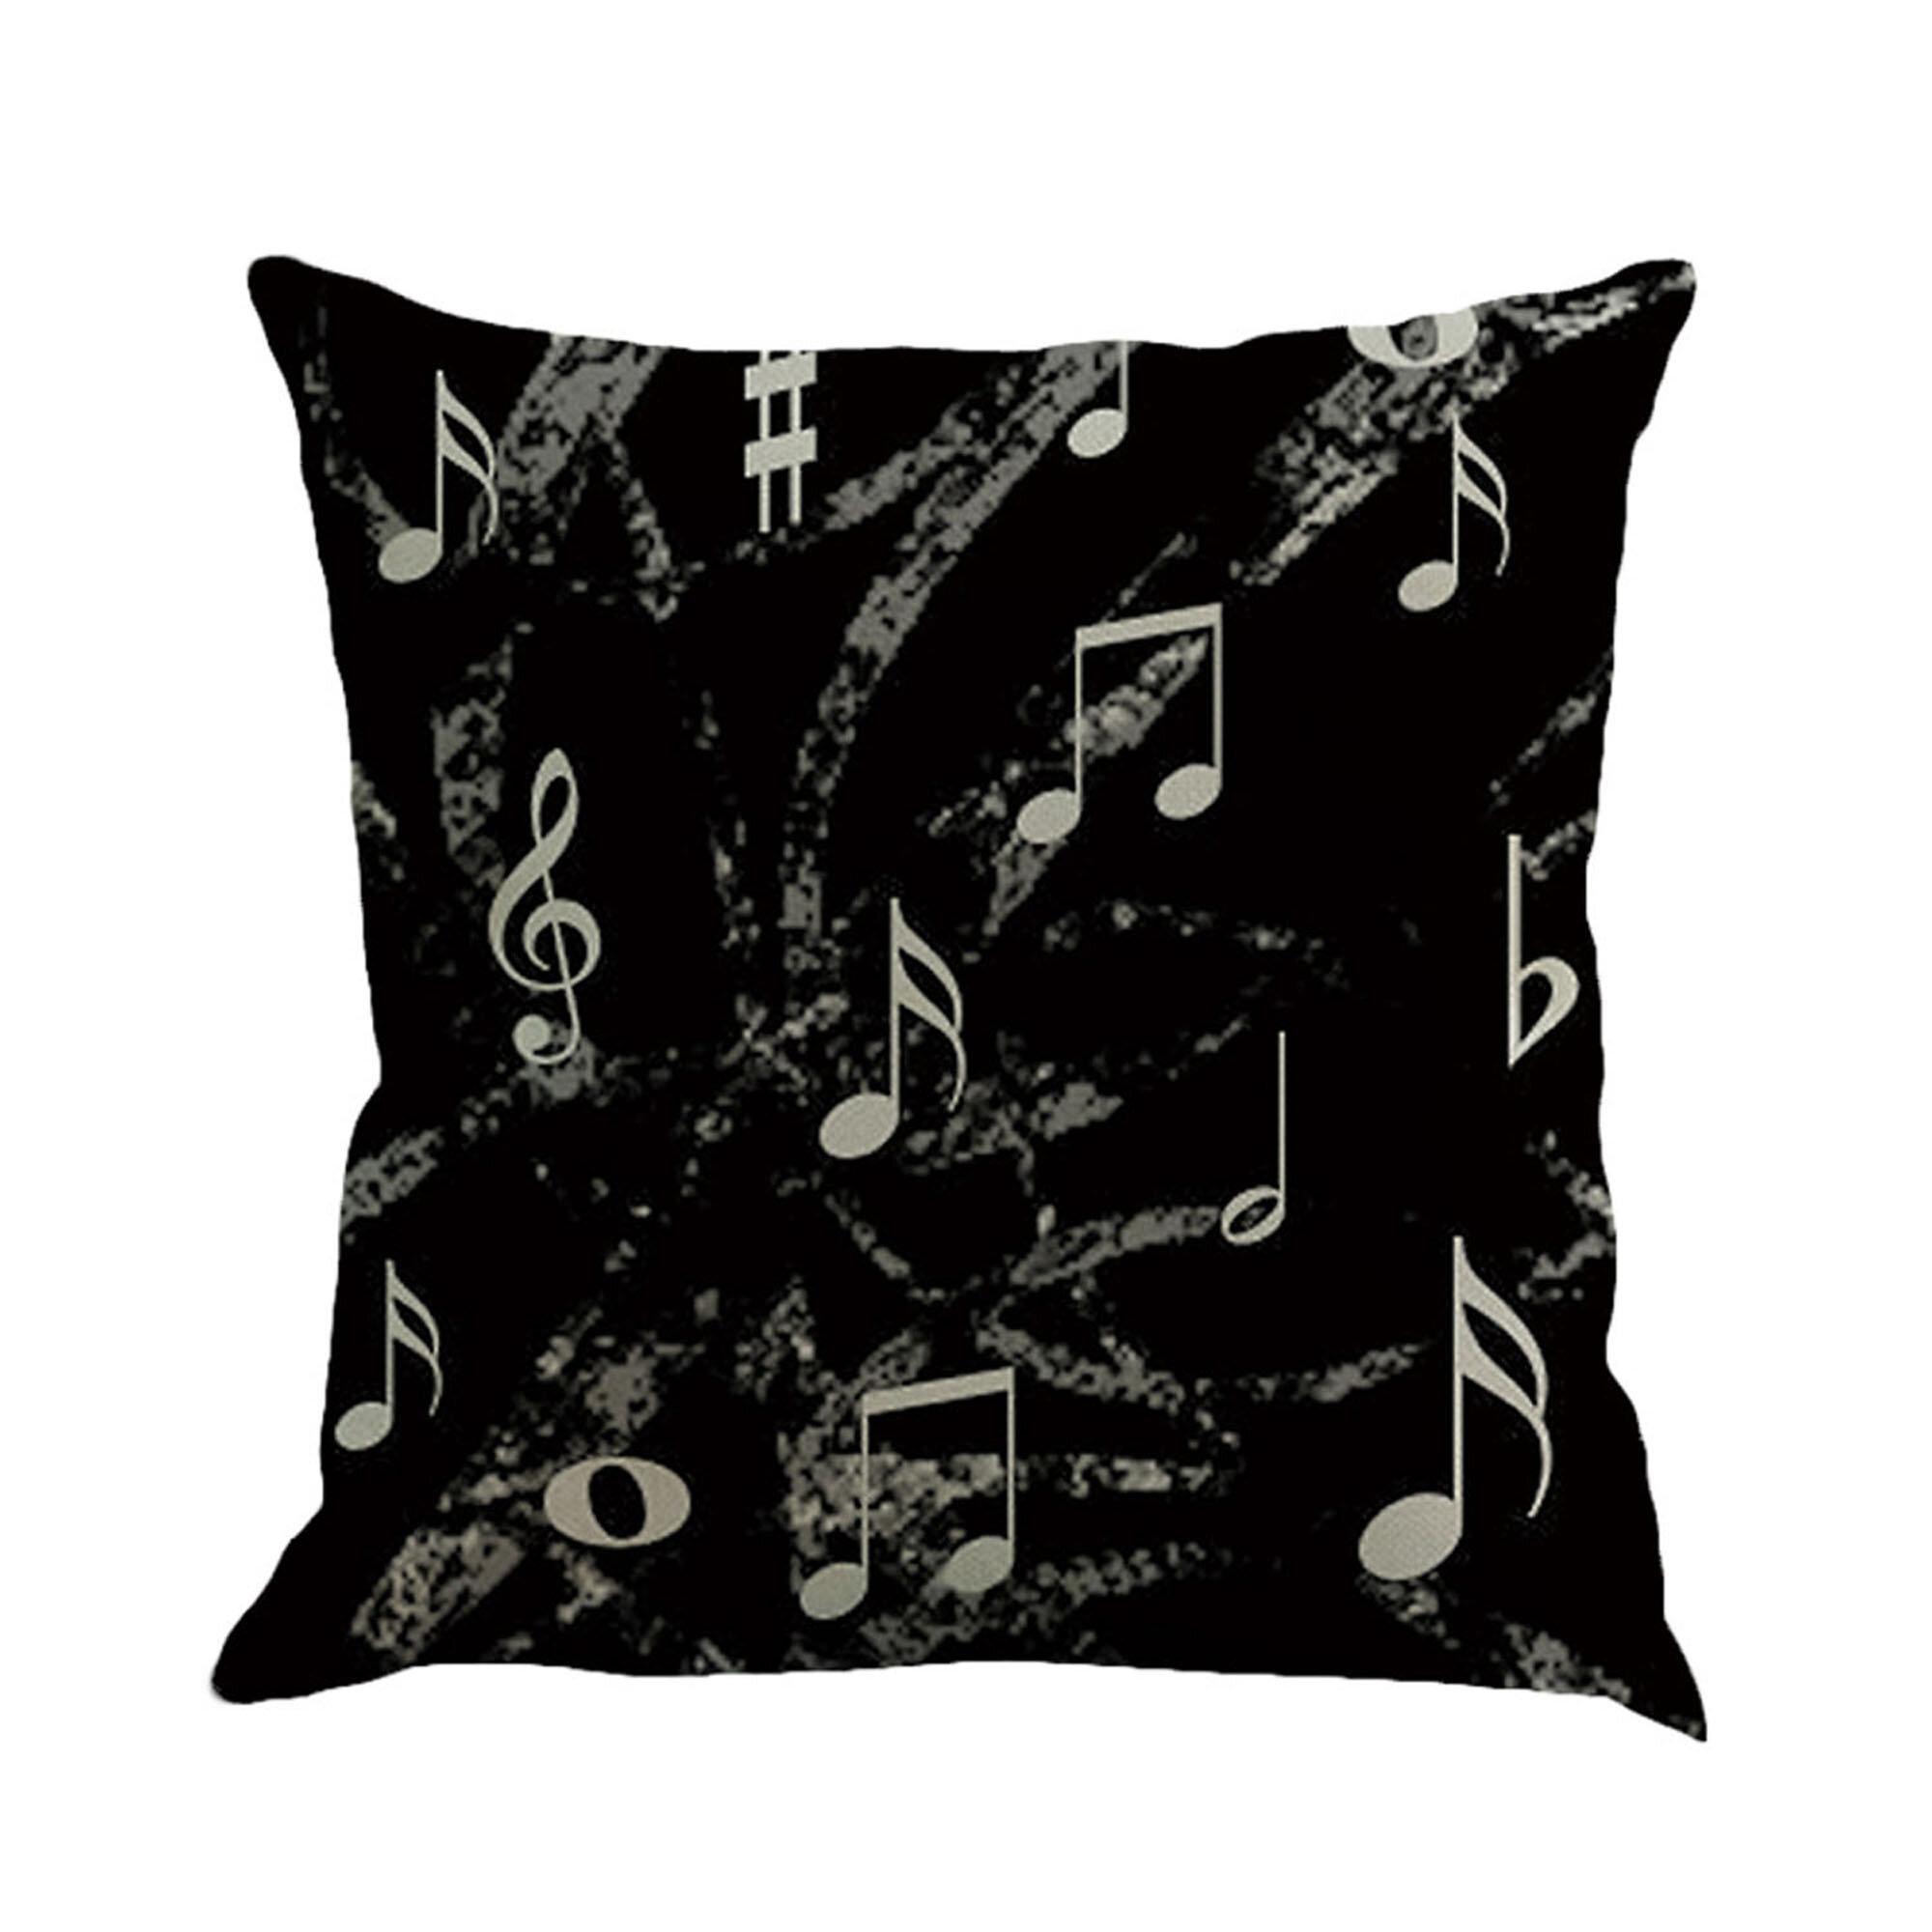 Red Barrel Studio Schroedersmusic Notes Cotton Throw Pillow Reviews Wayfair